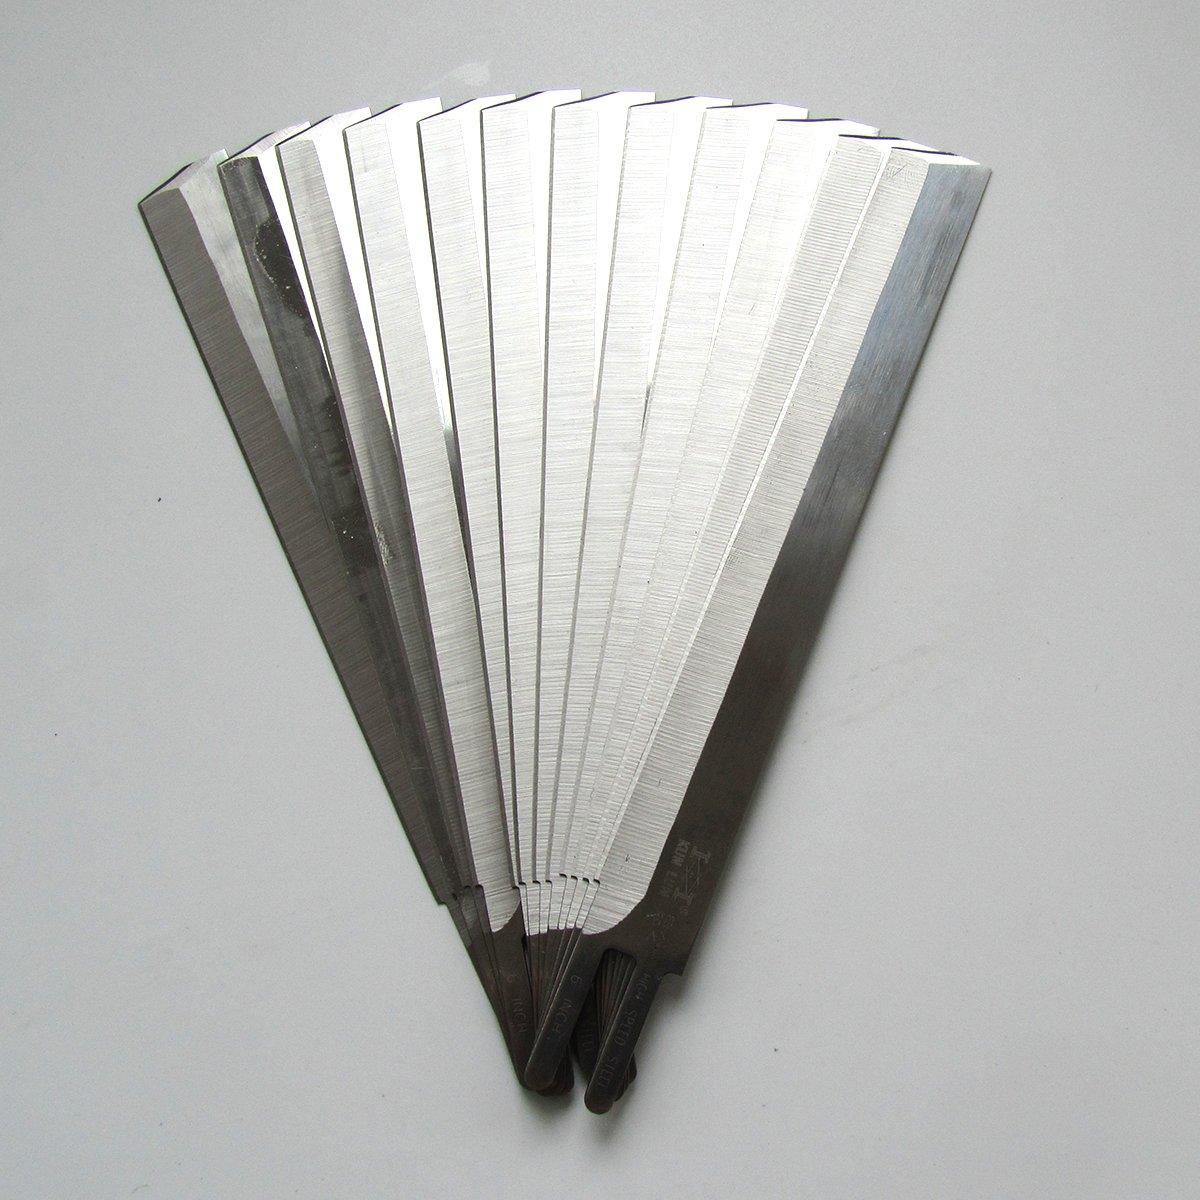 KUNPENG - For Eastman Straight Cutting Machine 6'' Knife Blades - 12 Pack #6E-KL-HSS